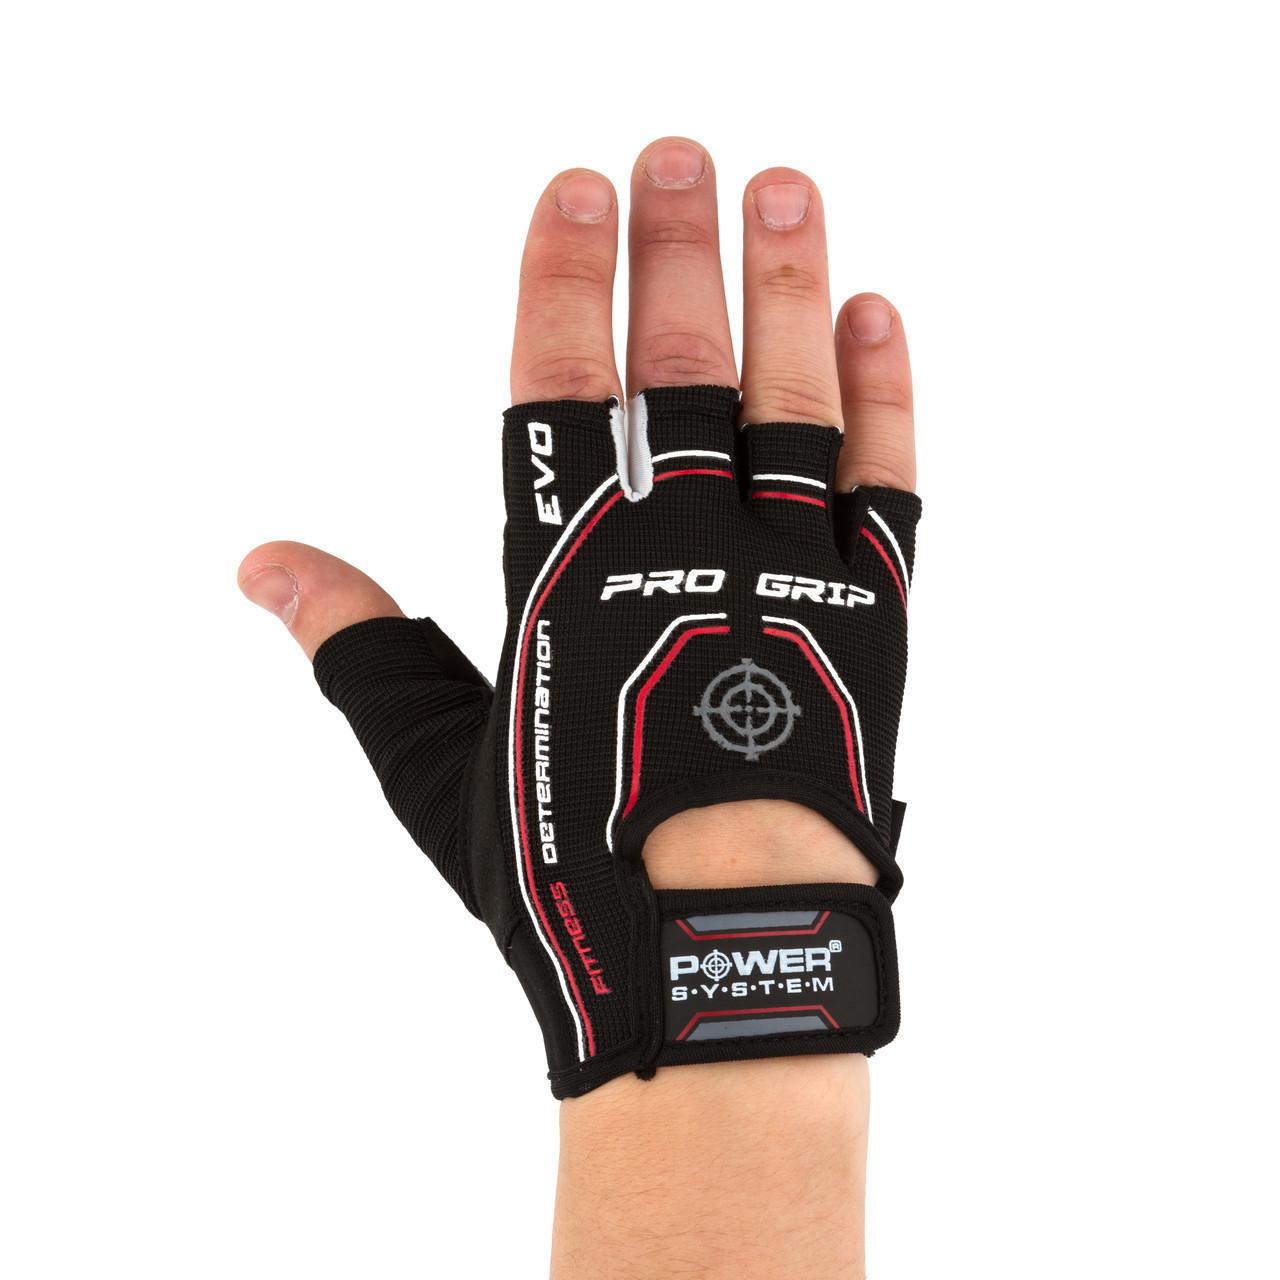 Перчатки для фитнеса и тяжелой атлетики Power System Pro Grip EVO PS-2250E M Black